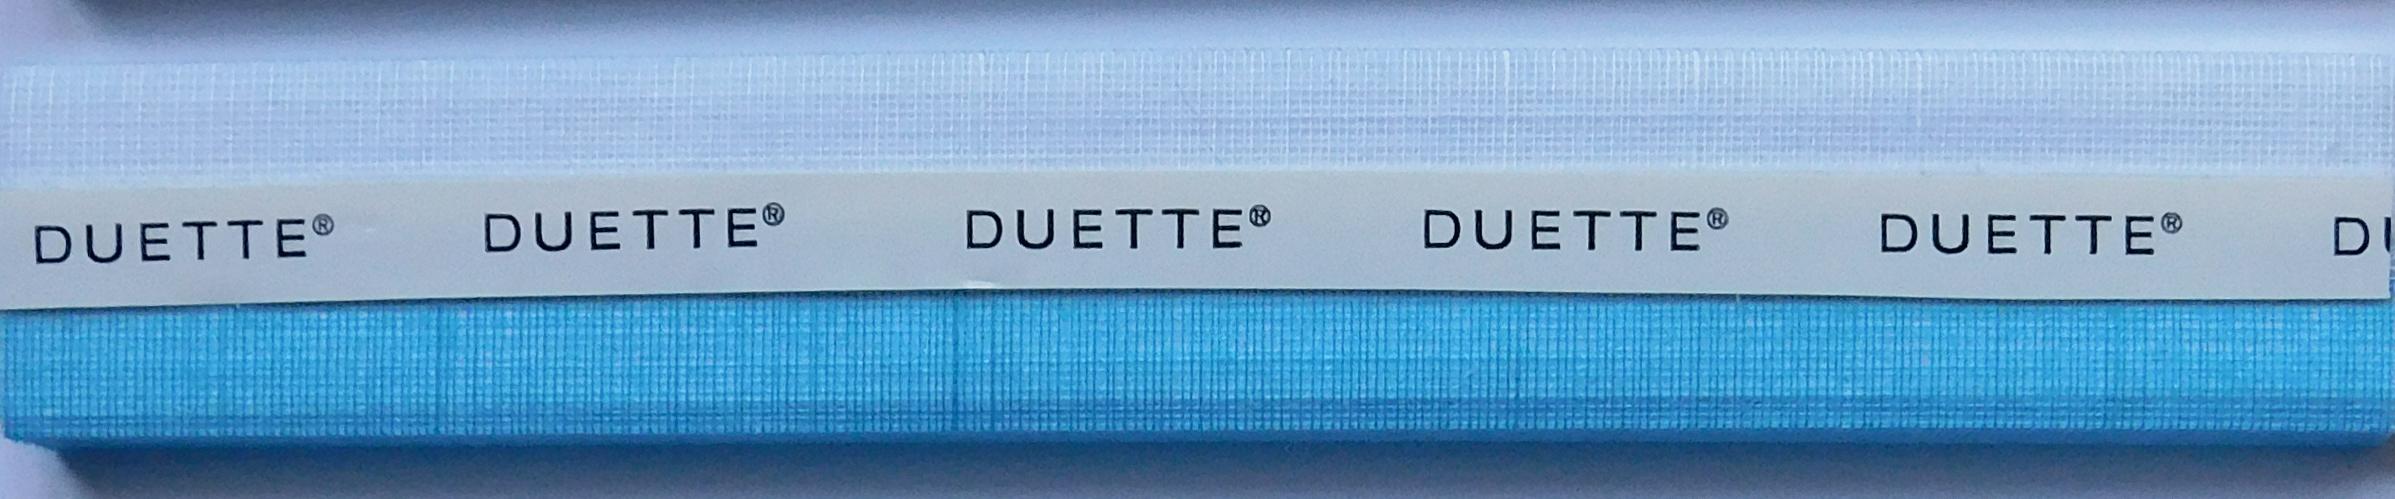 Batiste Scandia-Blue Duette Blind Fabric Sample